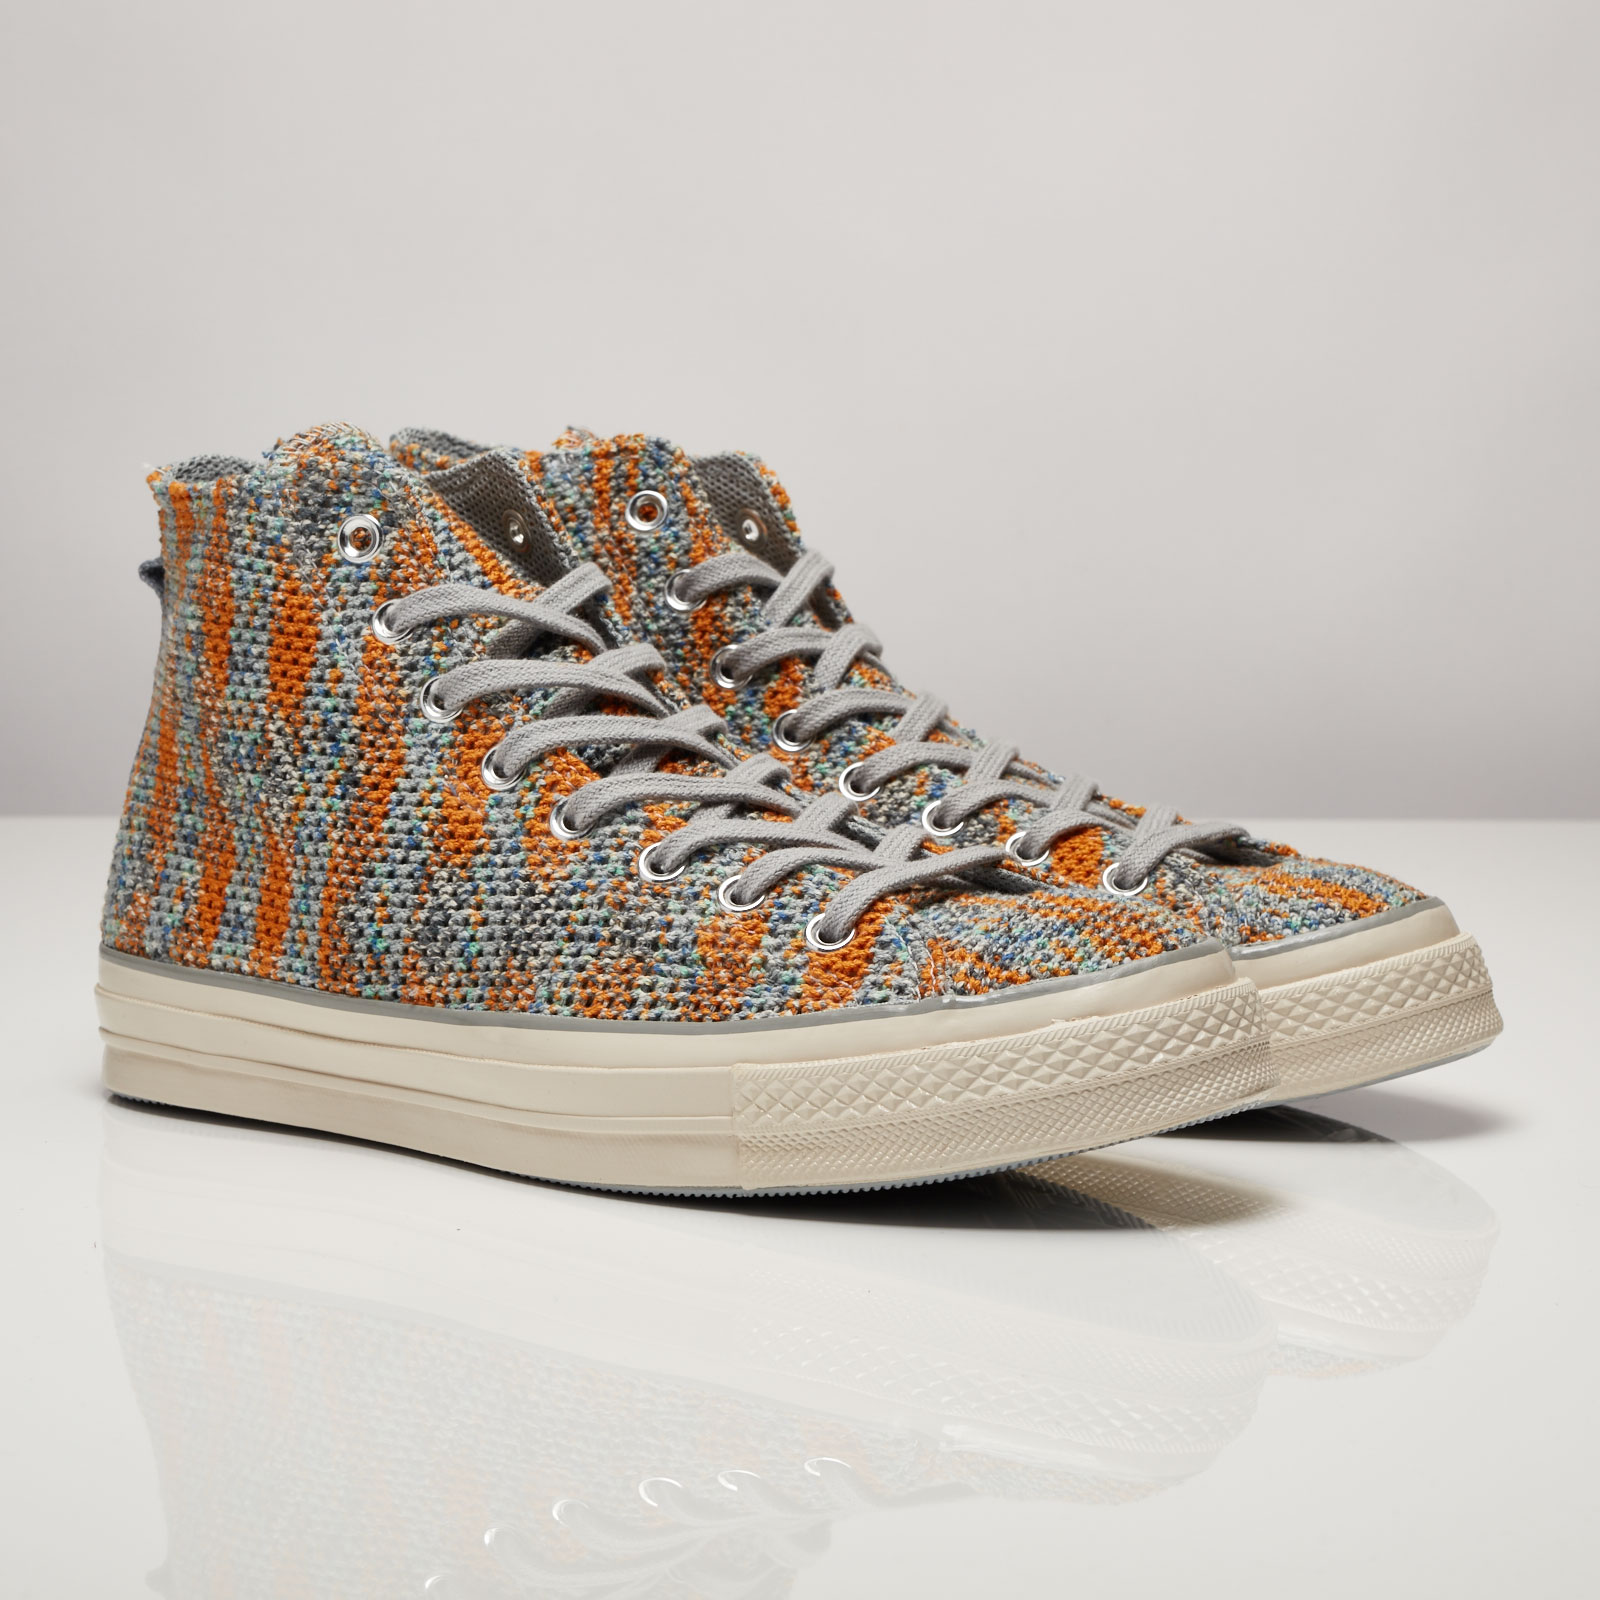 Converse Chuck Taylor All Star Missoni Hi - 153106c - Sneakersnstuff ... 82efc1ce491